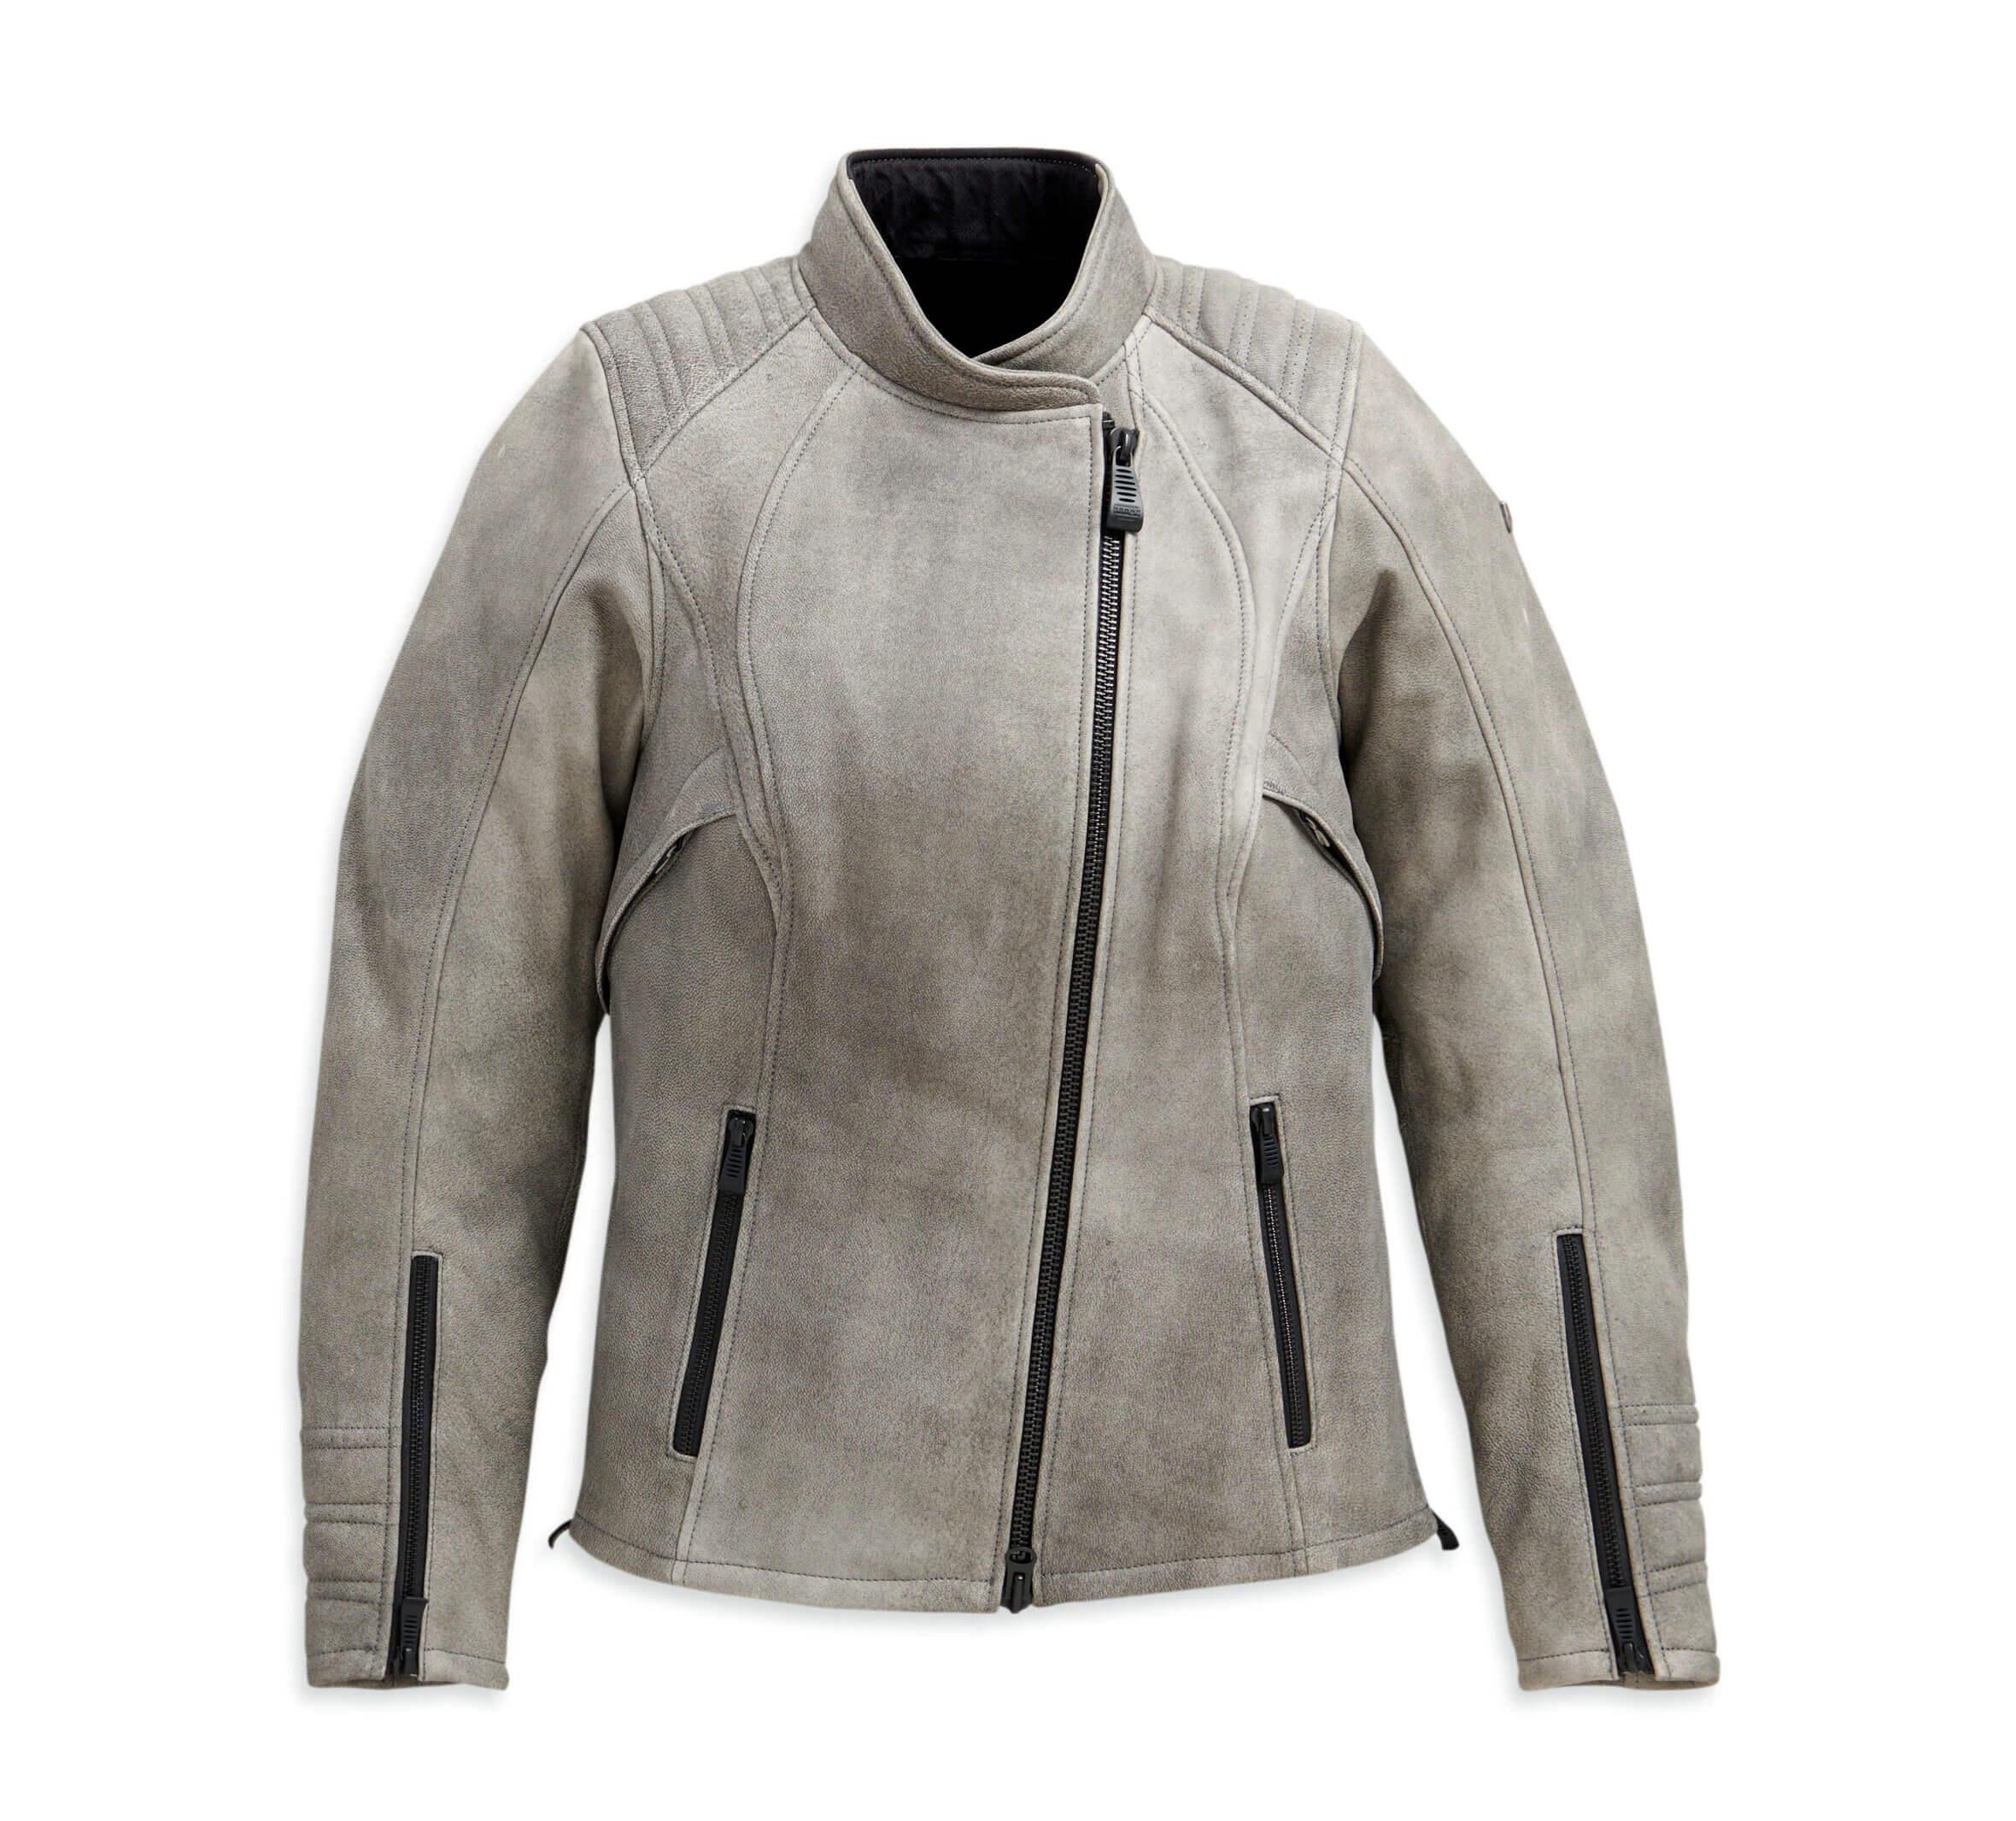 Grey Harley Davidson Motorcycle Leather Jacket